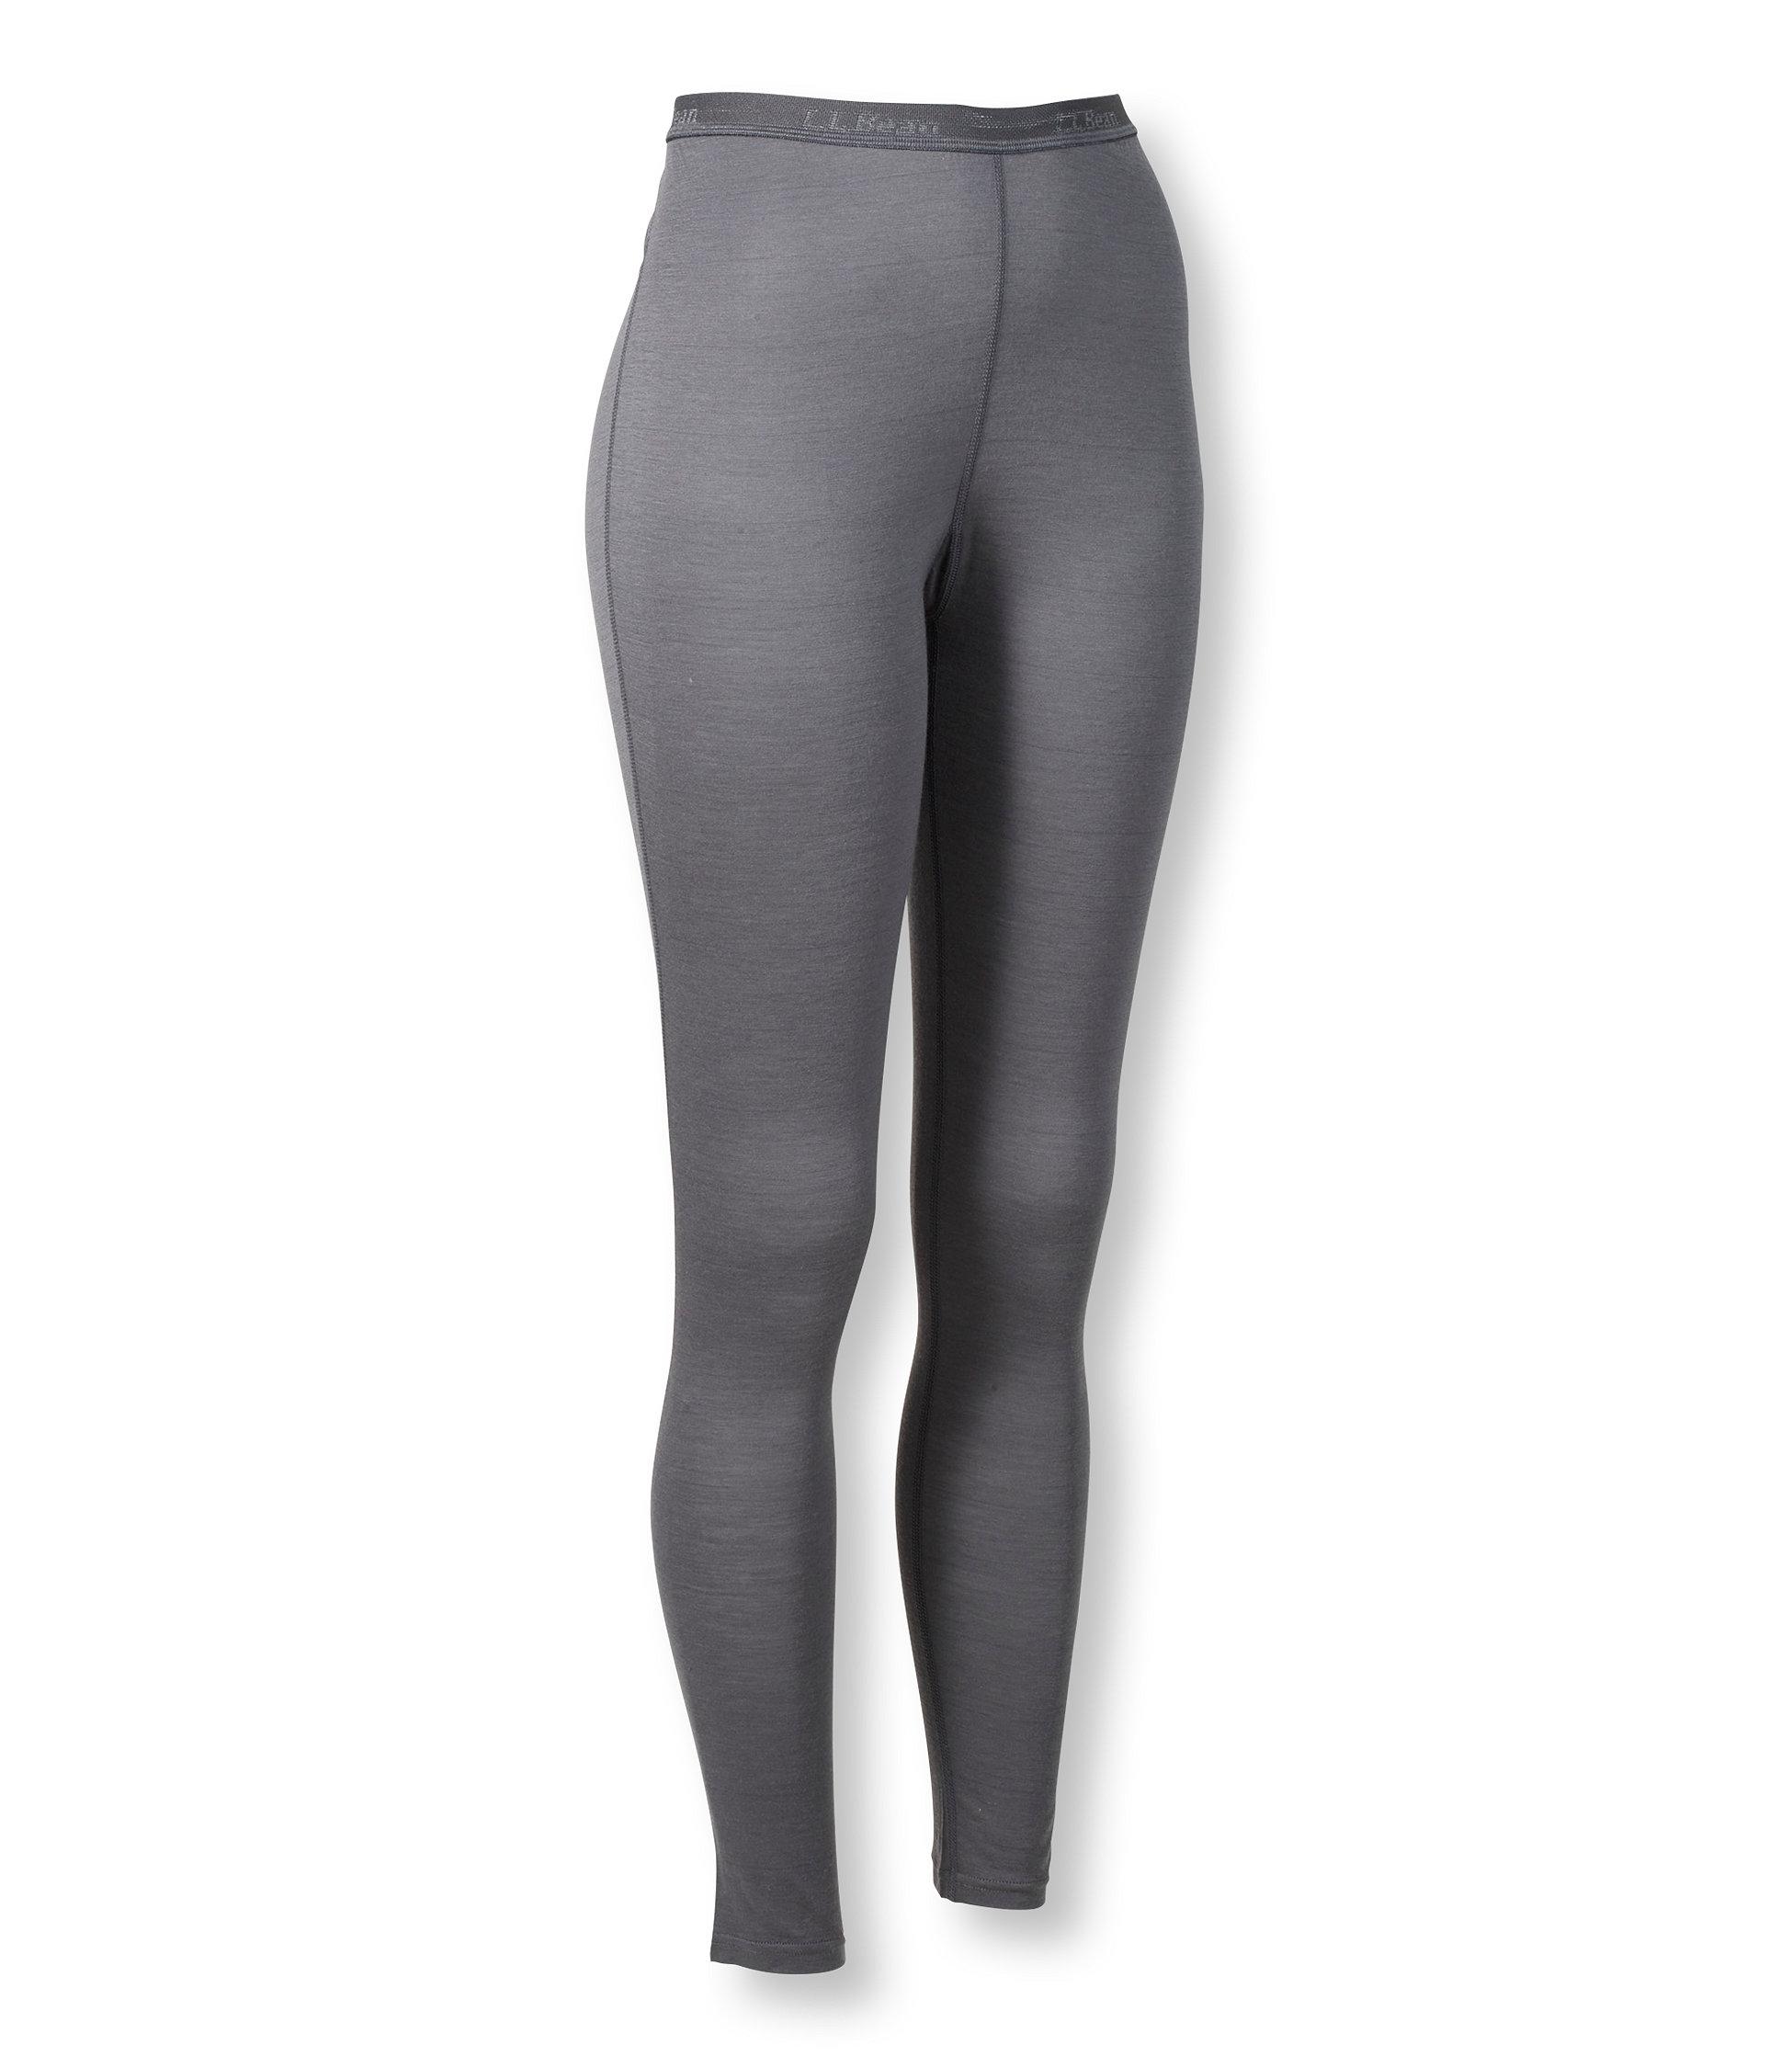 photo: L.L.Bean Men's Cresta Wool Base Layer, Pants Lightweight base layer bottom